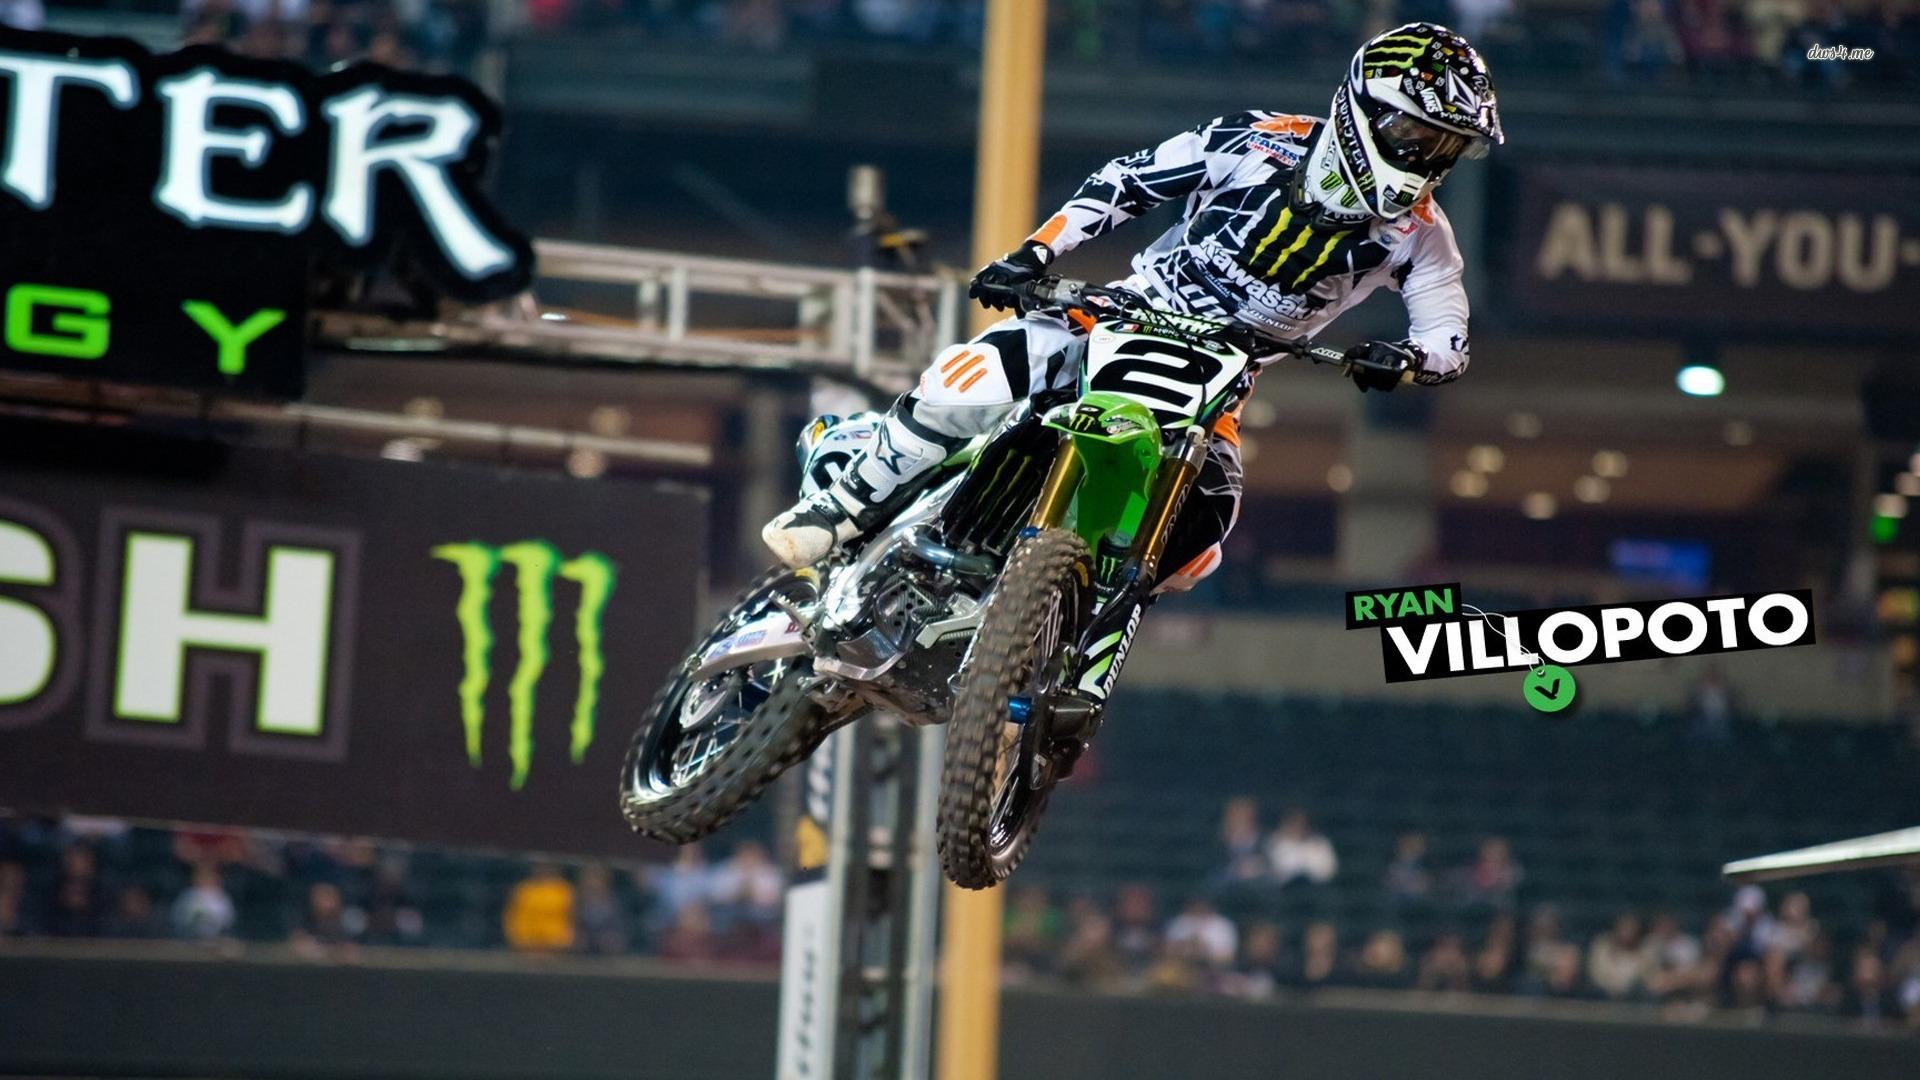 Ryan Villopoto wallpaper   Sport wallpapers   26355 1920x1080